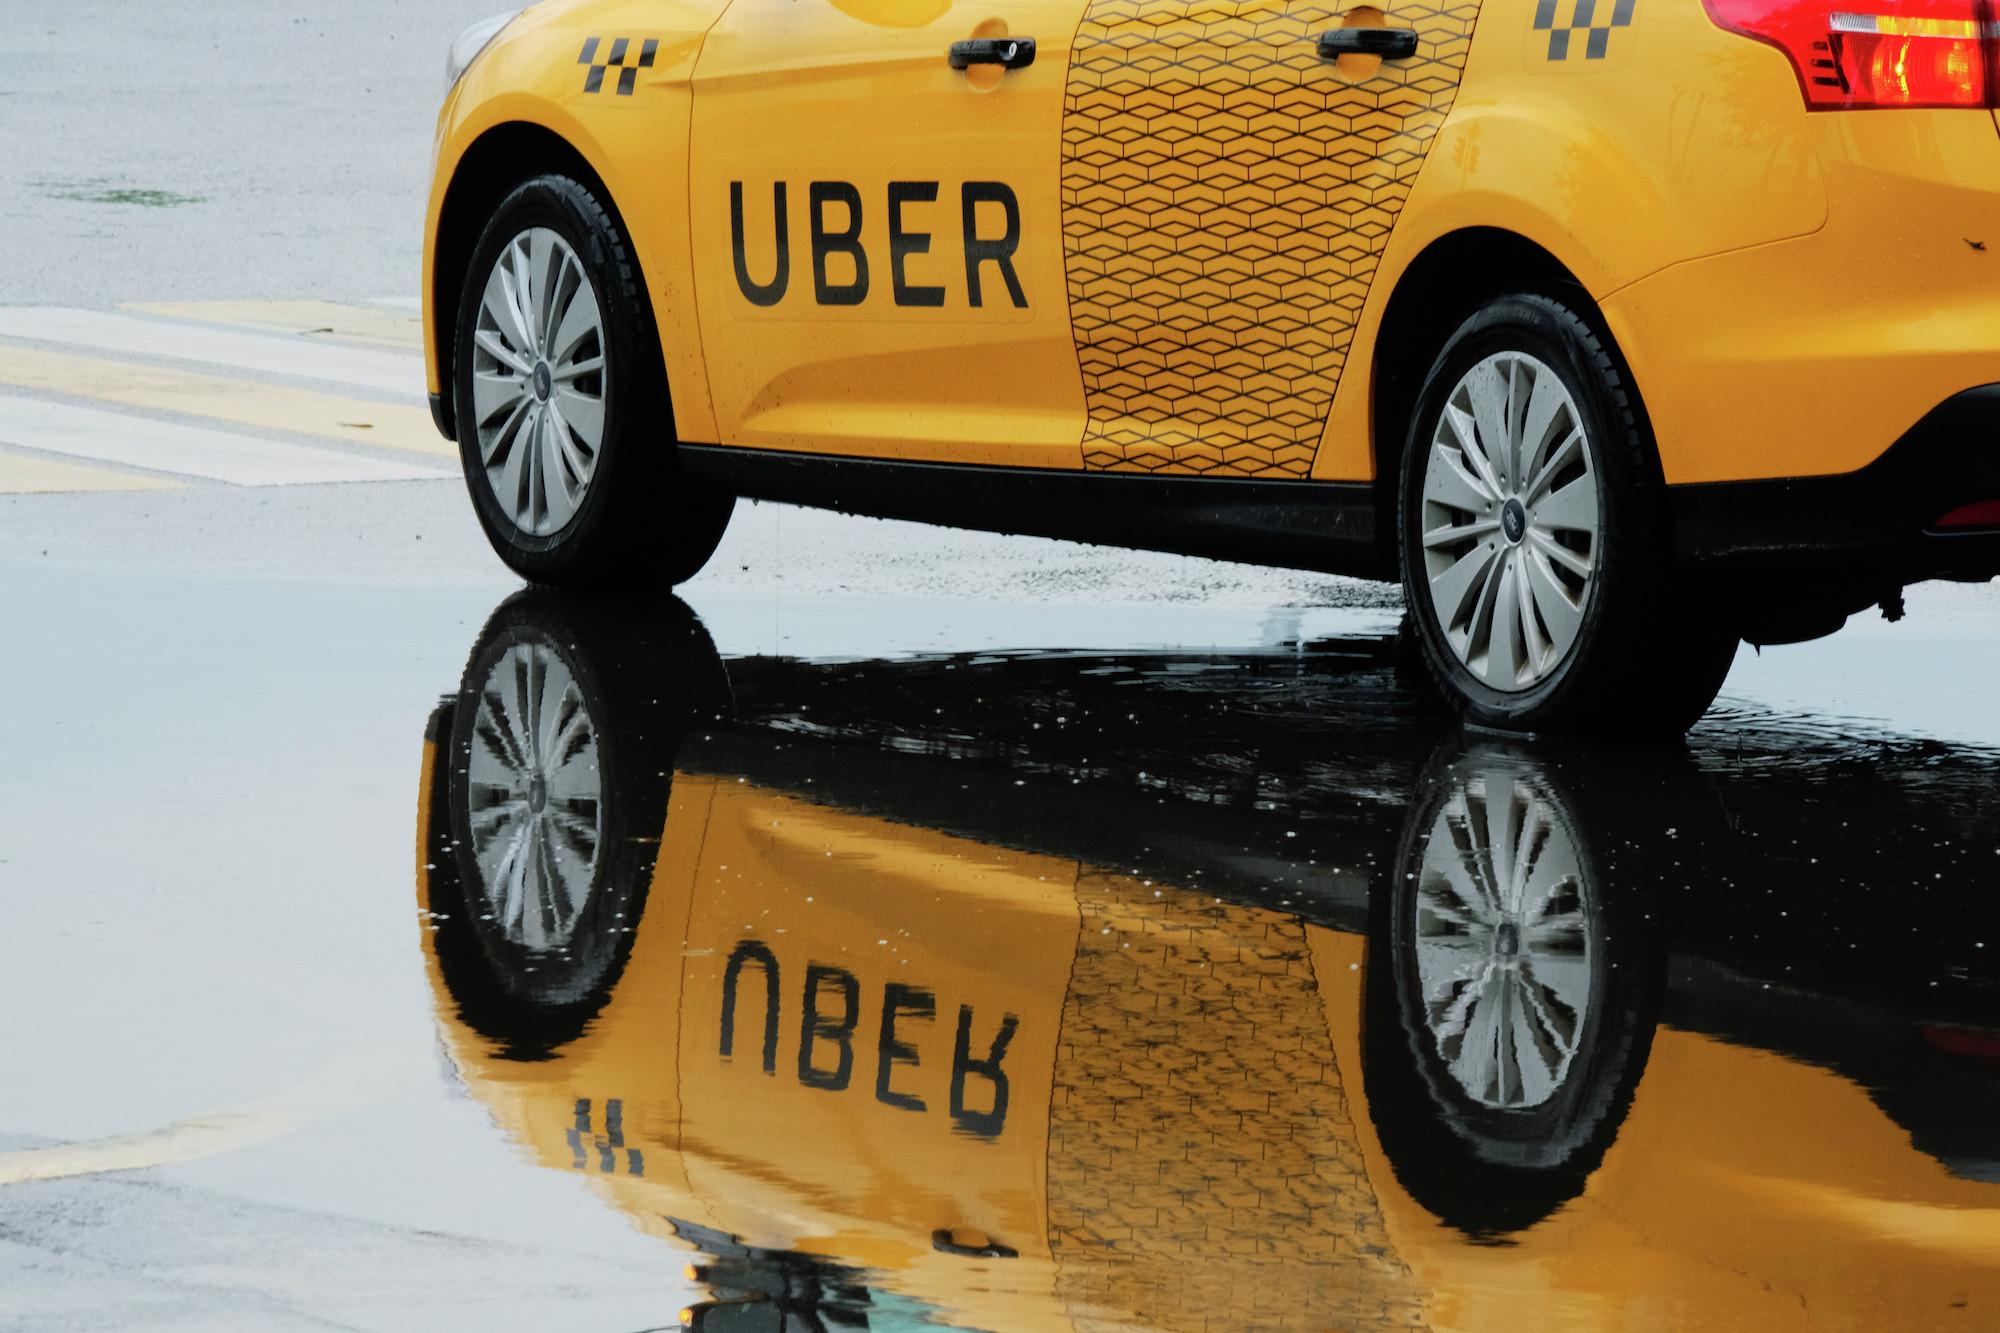 <p><span>Автомобиль службы такси Uber на улице Москвы.&nbsp;Фото: &copy; РИА Новости/Наталья Селиверстова</span></p>